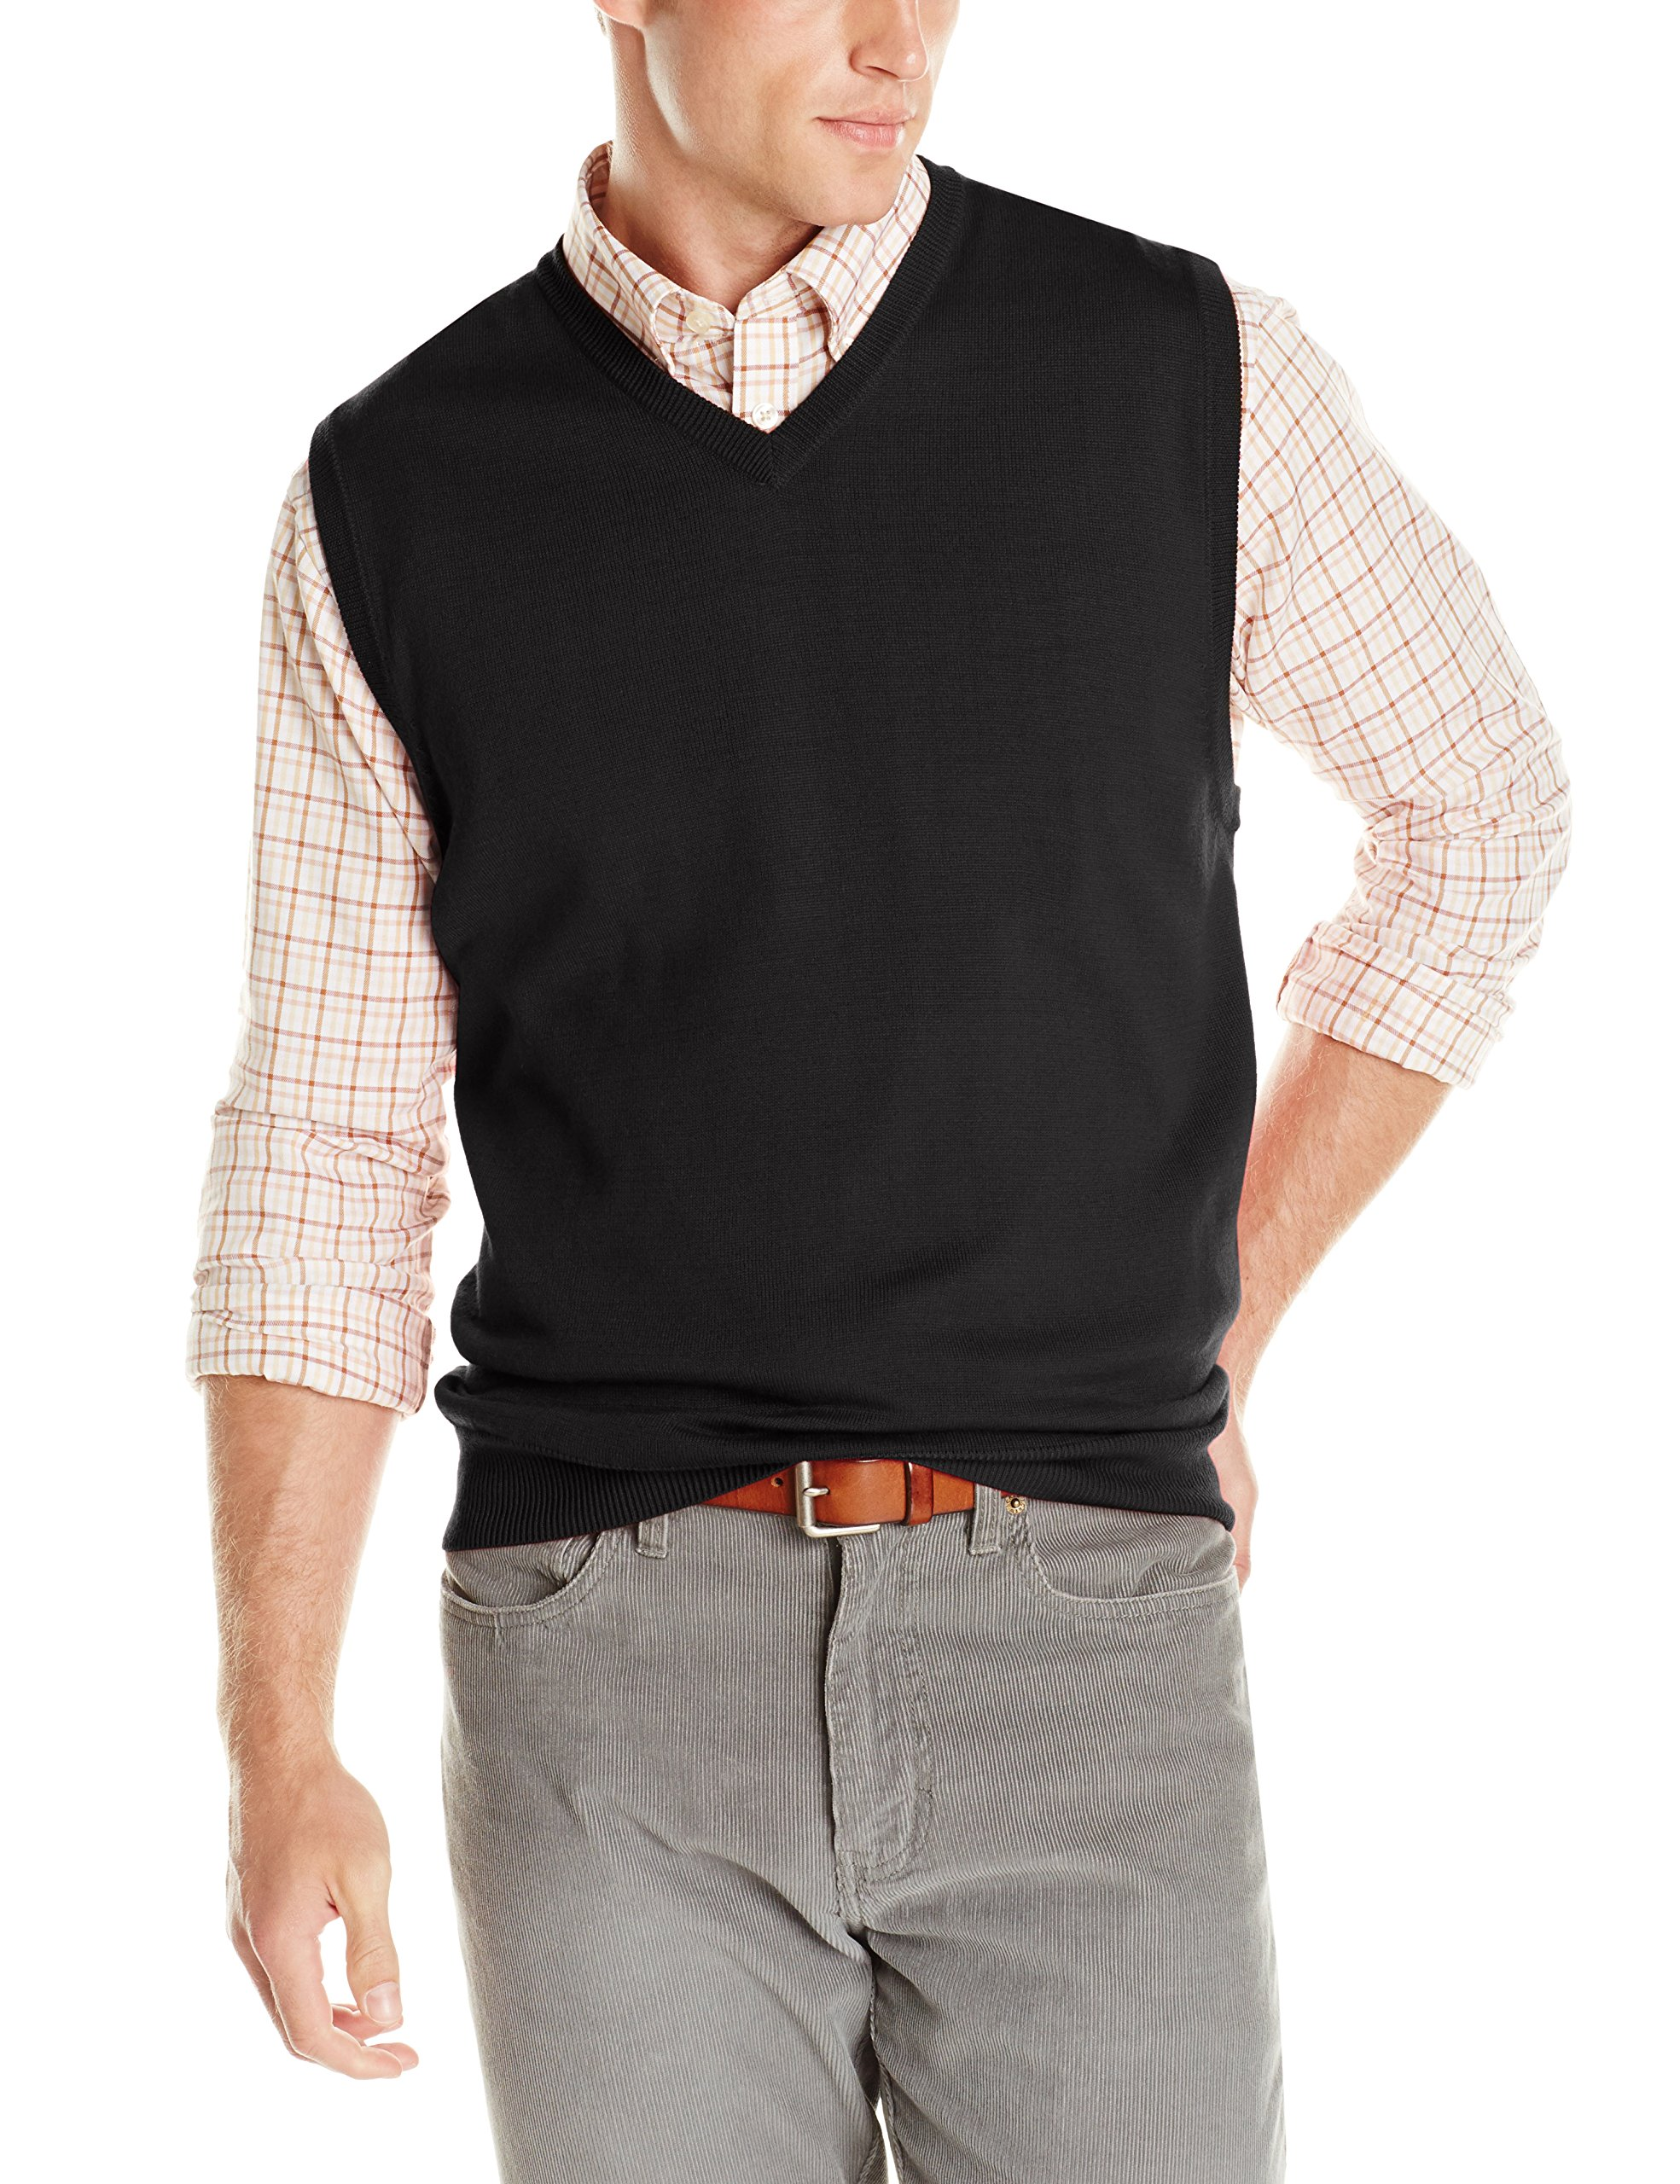 Cutter & Buck Men's Douglas V-Neck Sweater Vest, Black, X-large by Cutter